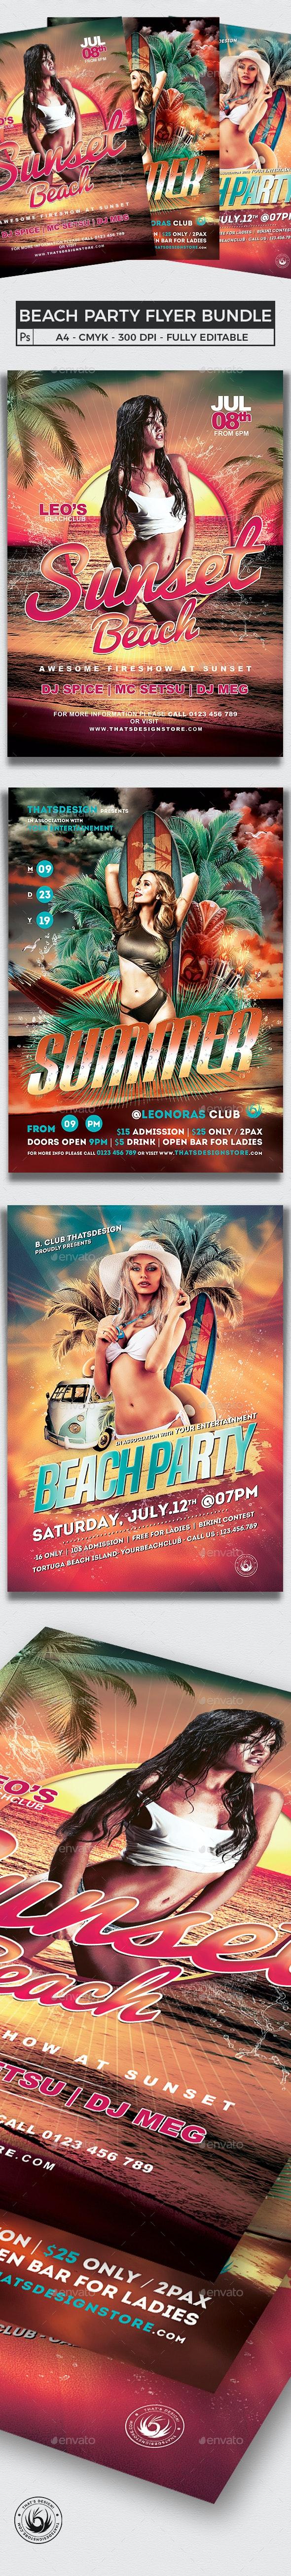 Beach Party Flyer Bundle V1